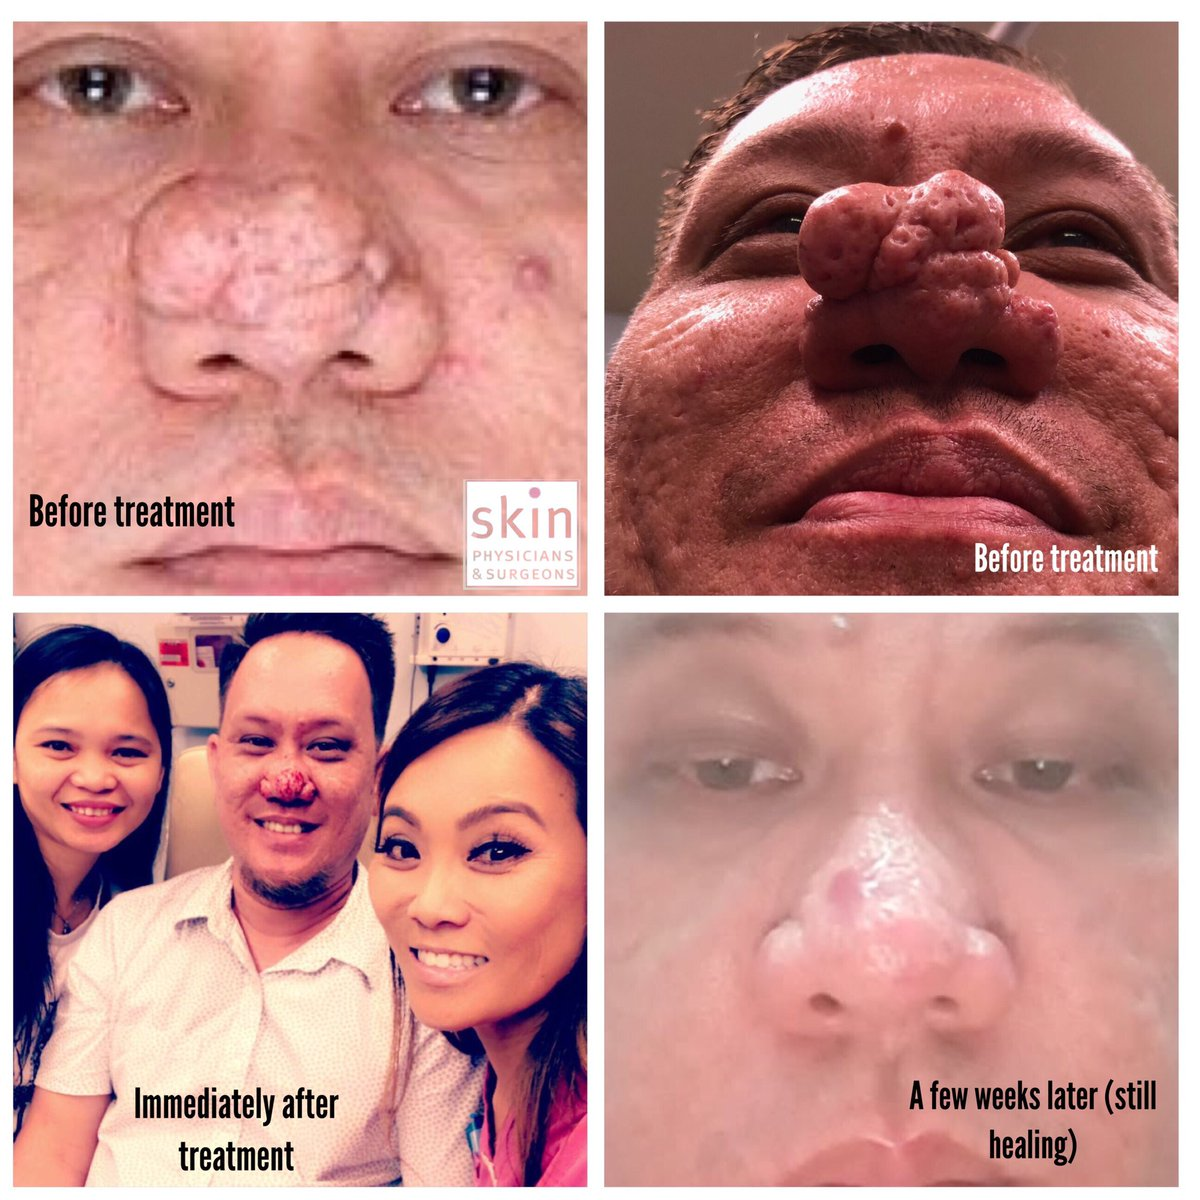 Dr Pimple Popper on Twitter: